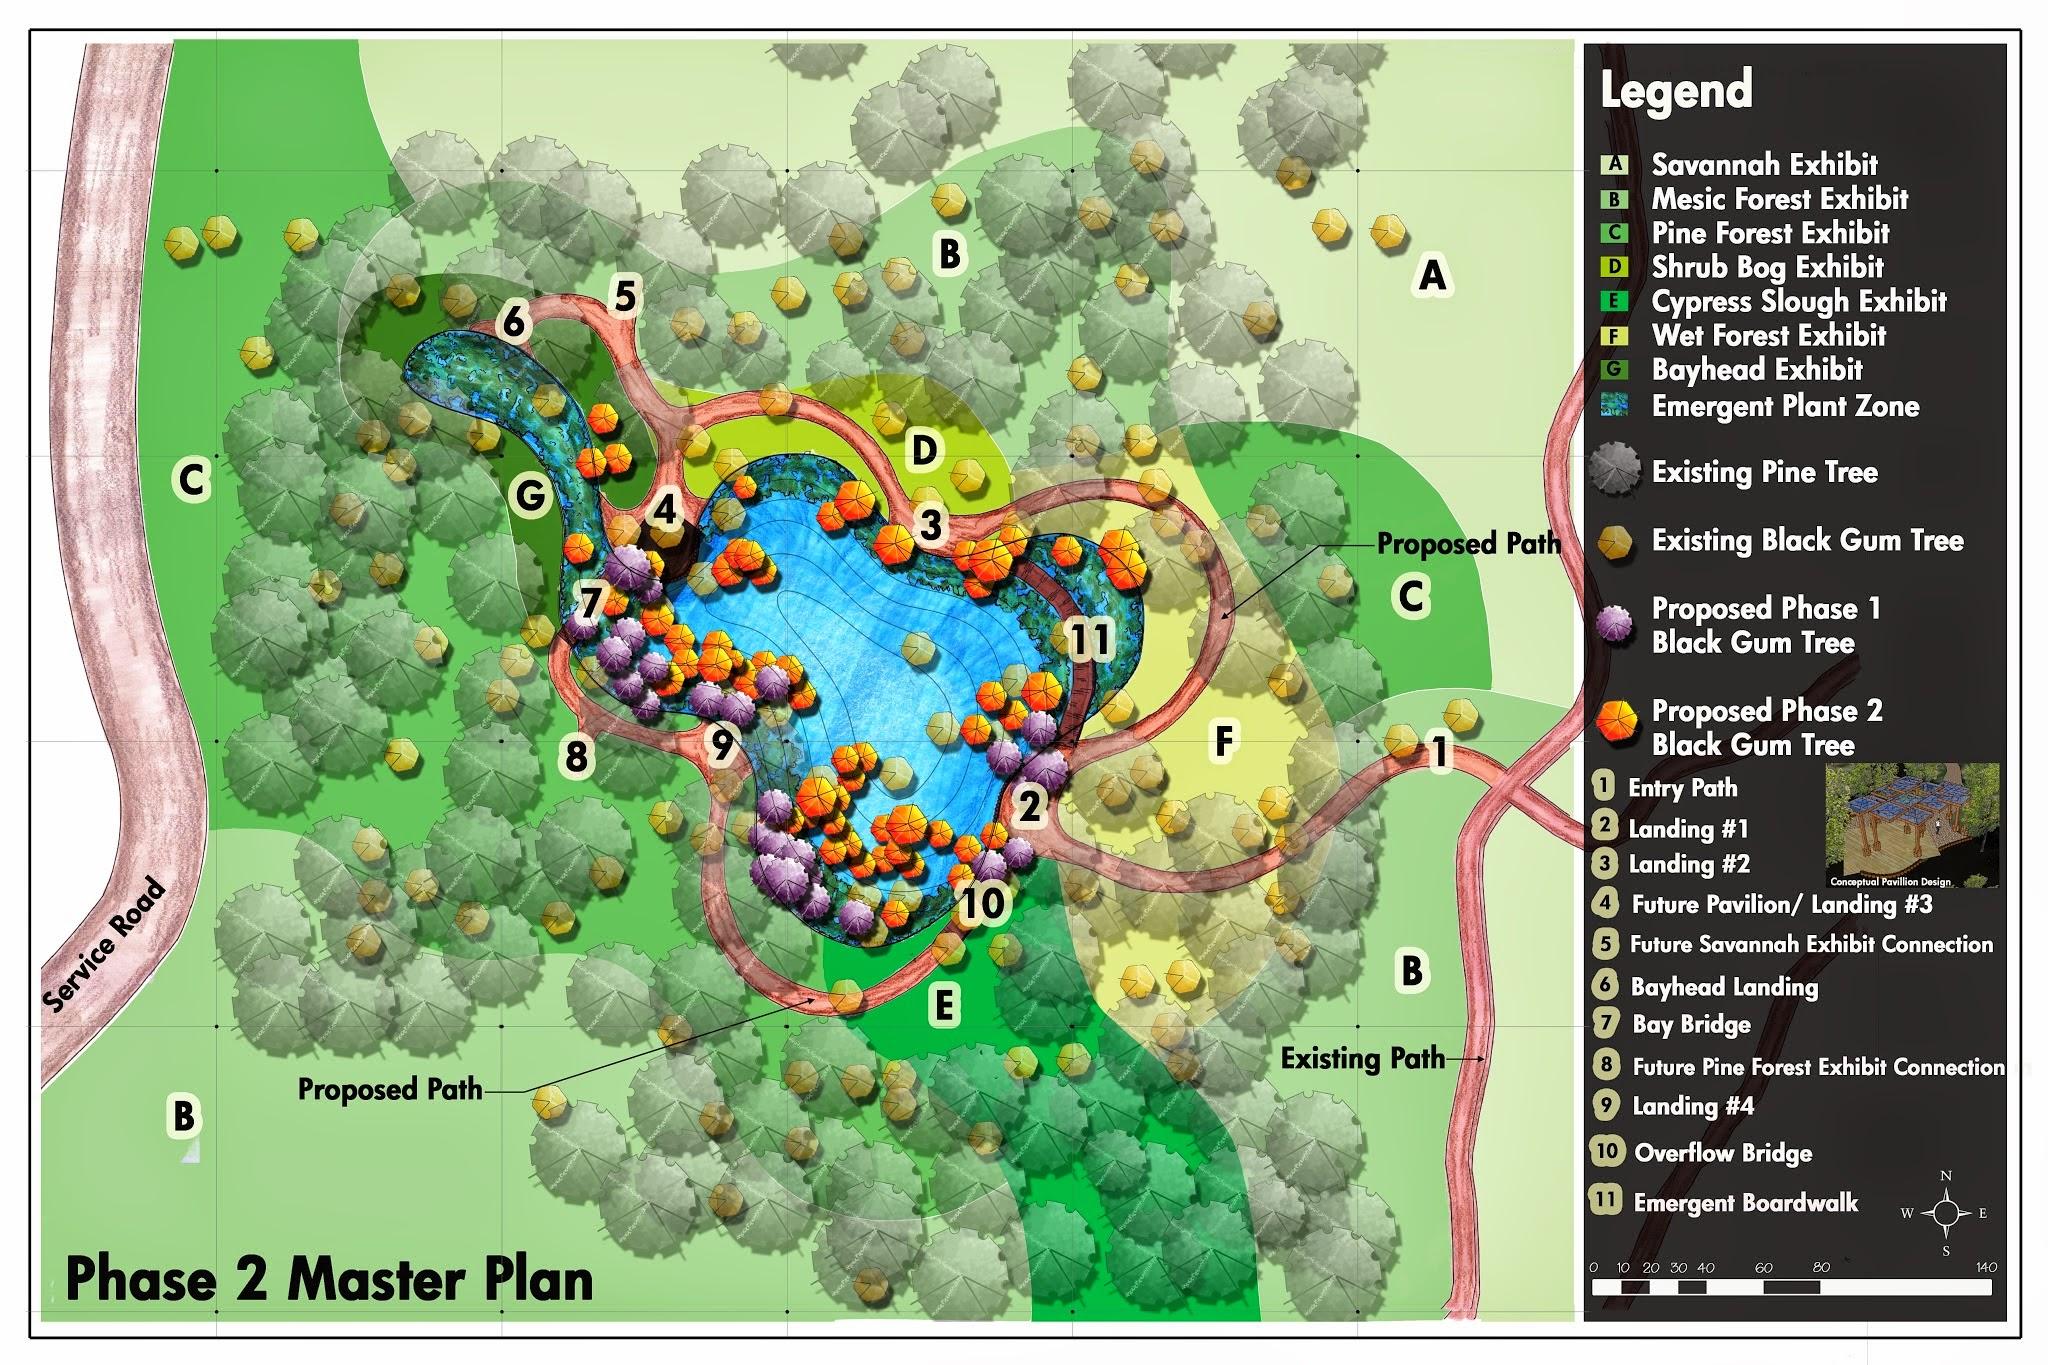 gum pond exhibit for crosby arboretum completed by prof brzuszek s landscape management seminar